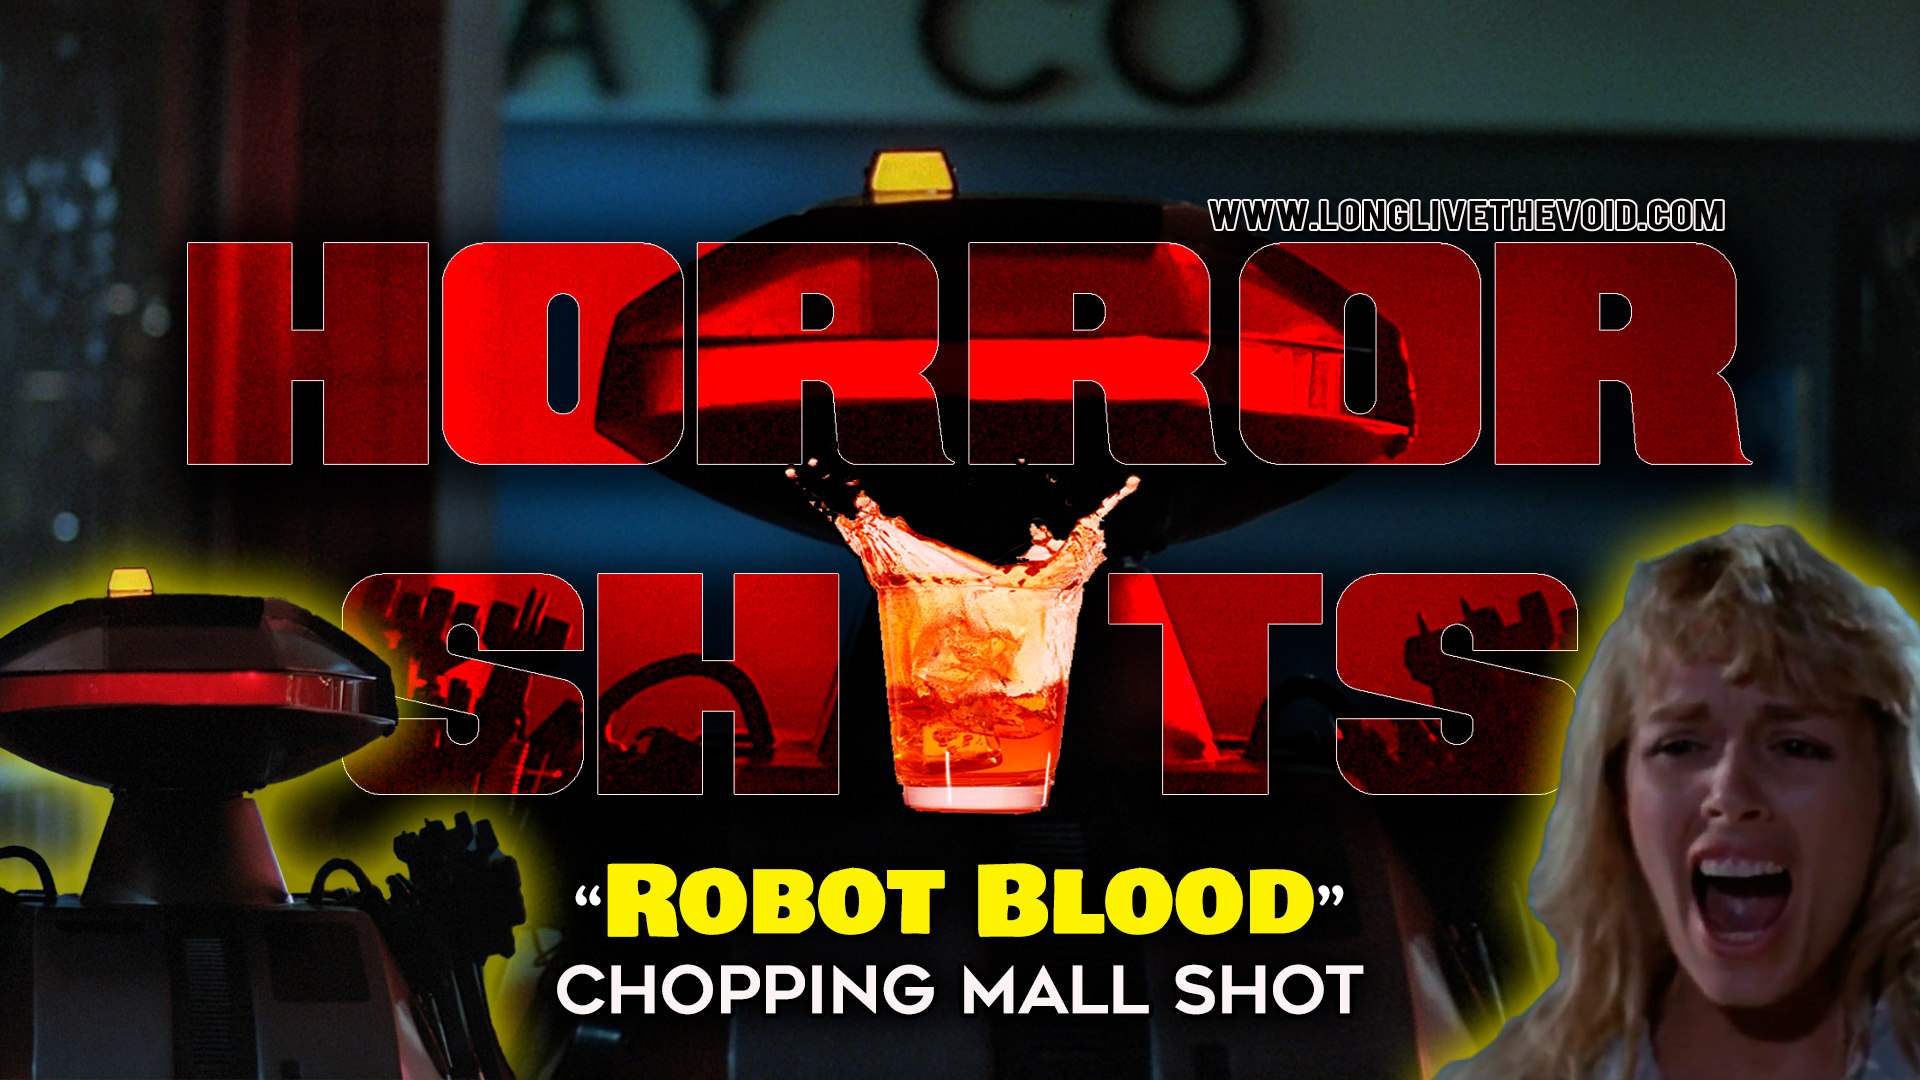 Chopping-Mall-1986-Shot-HorrorShots.jpg